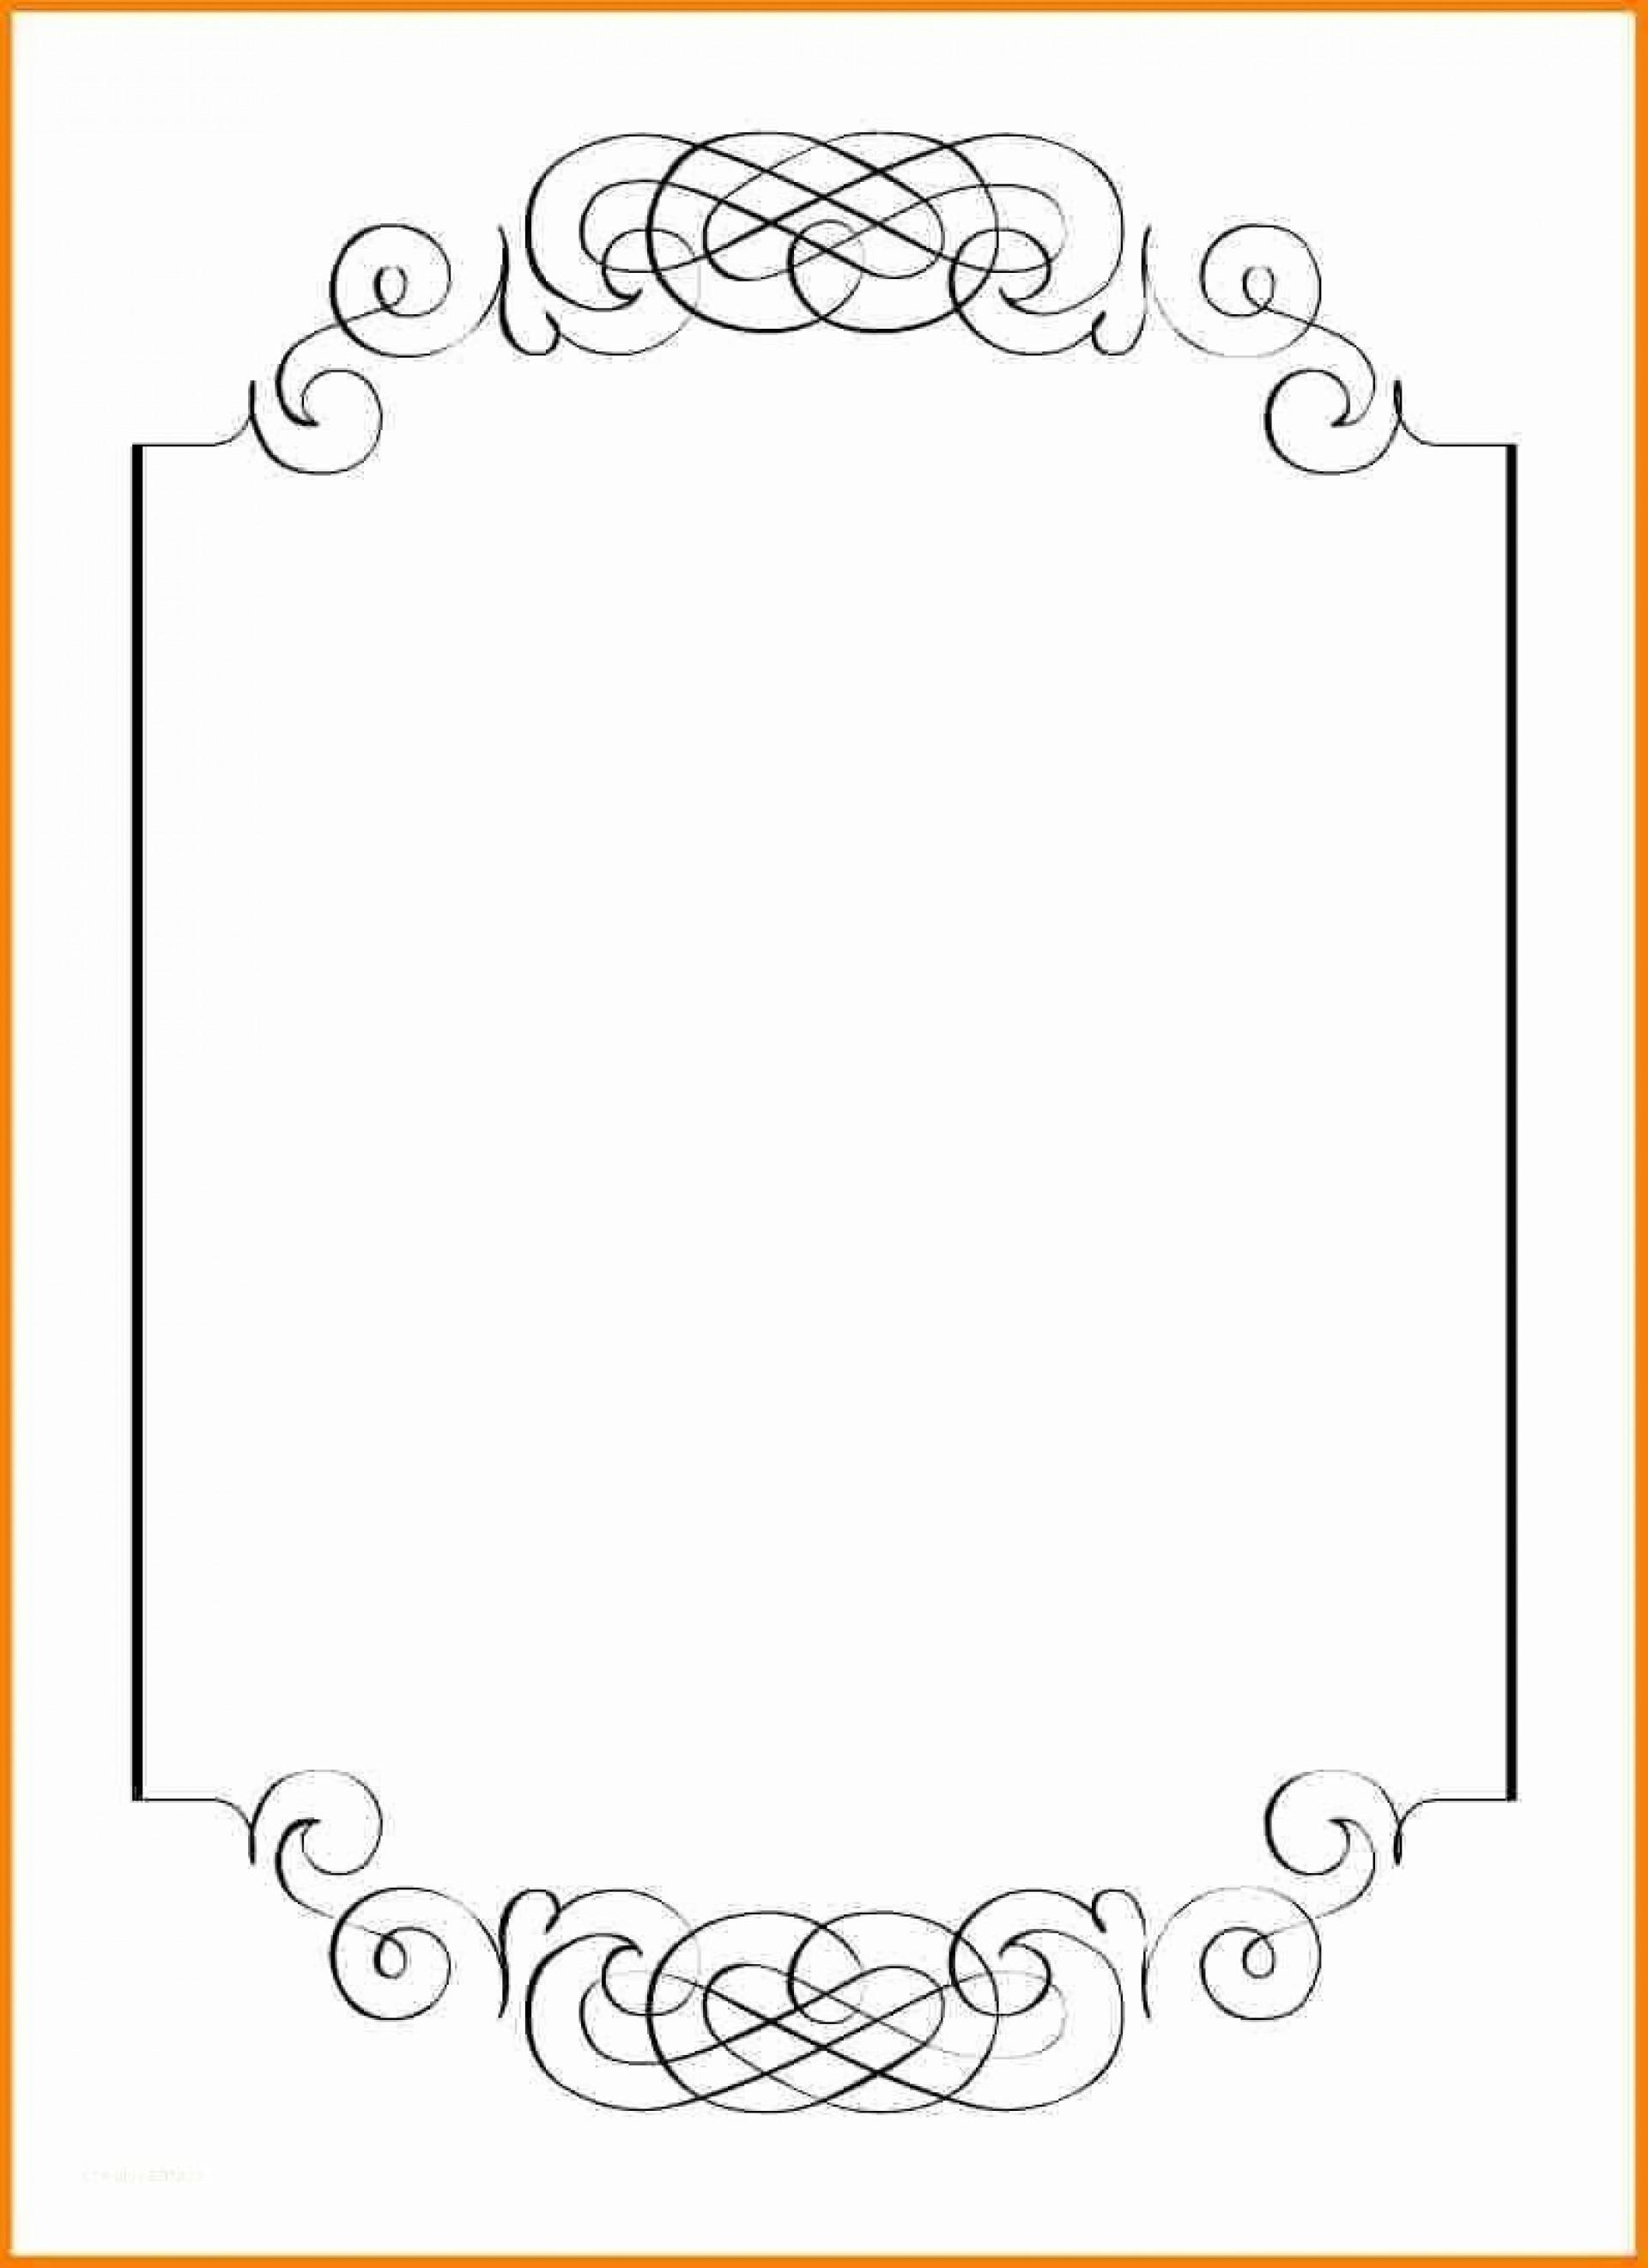 005 Singular Free Wedding Invitation Template For Word 2019 Image 1920